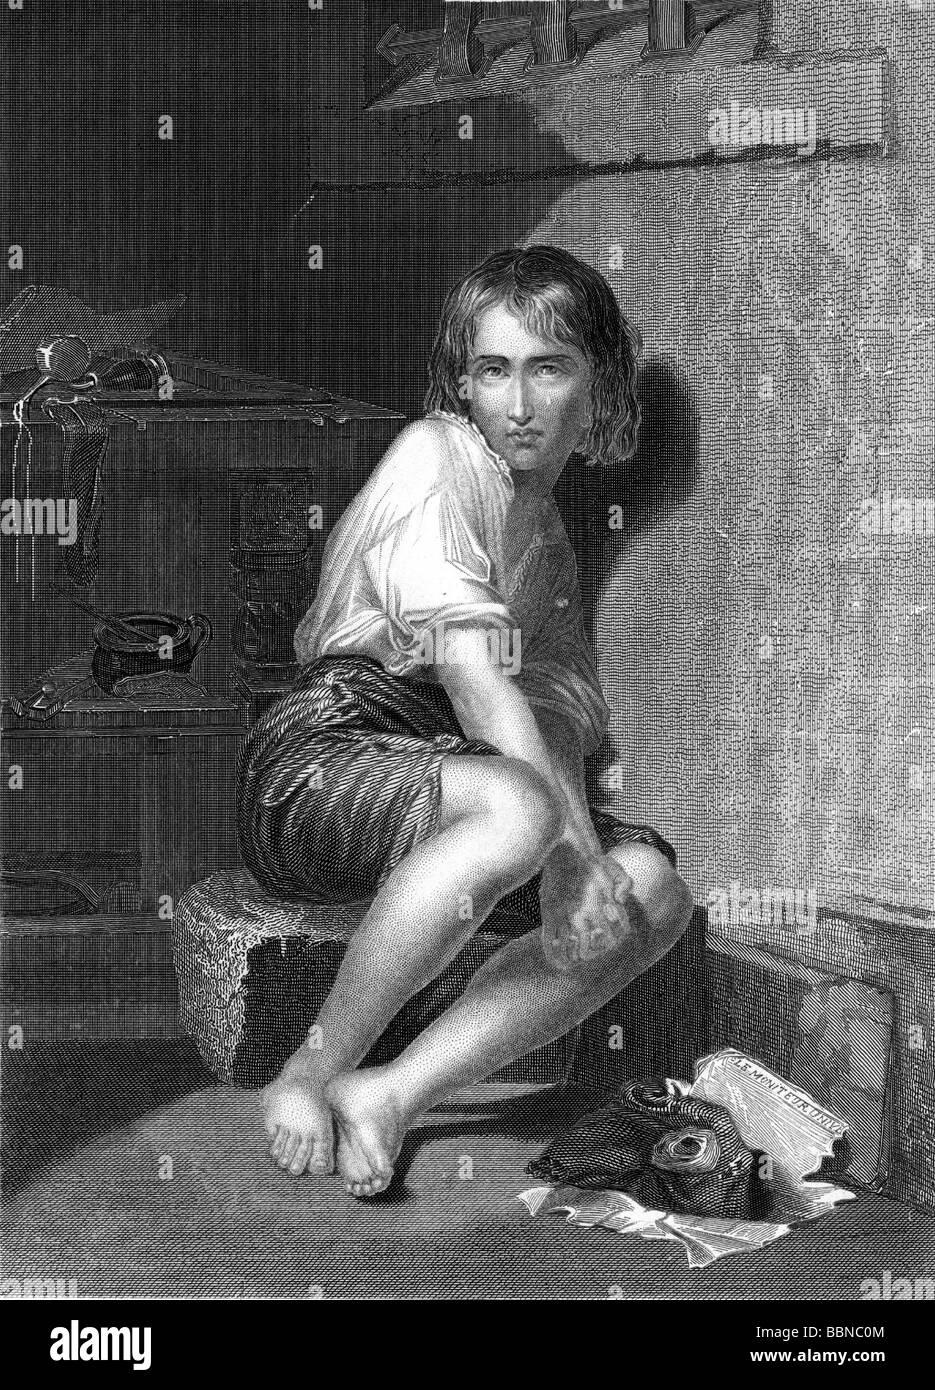 Louis xvii chair - Louis Xvii 27 3 1785 8 6 1795 Dauphin Of France